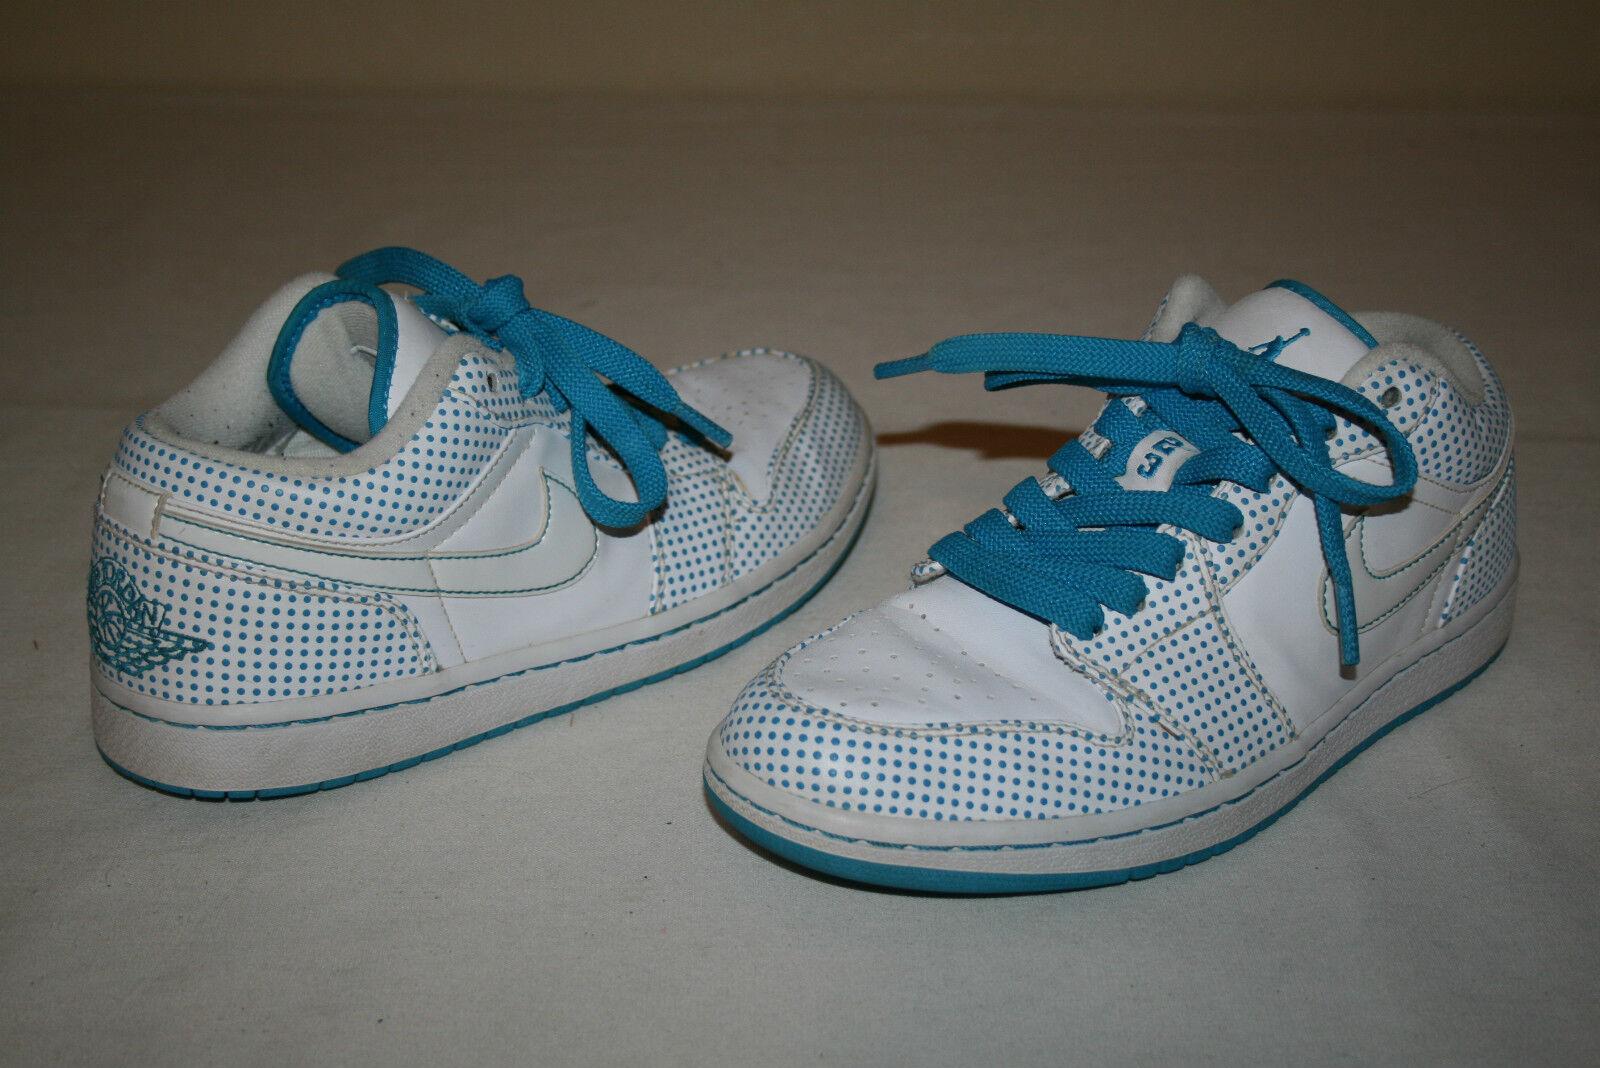 Jordans Nike Air Jordan Mens Sz 8 White Teal Low Top Basketball Shoes VERY NICE Special limited time